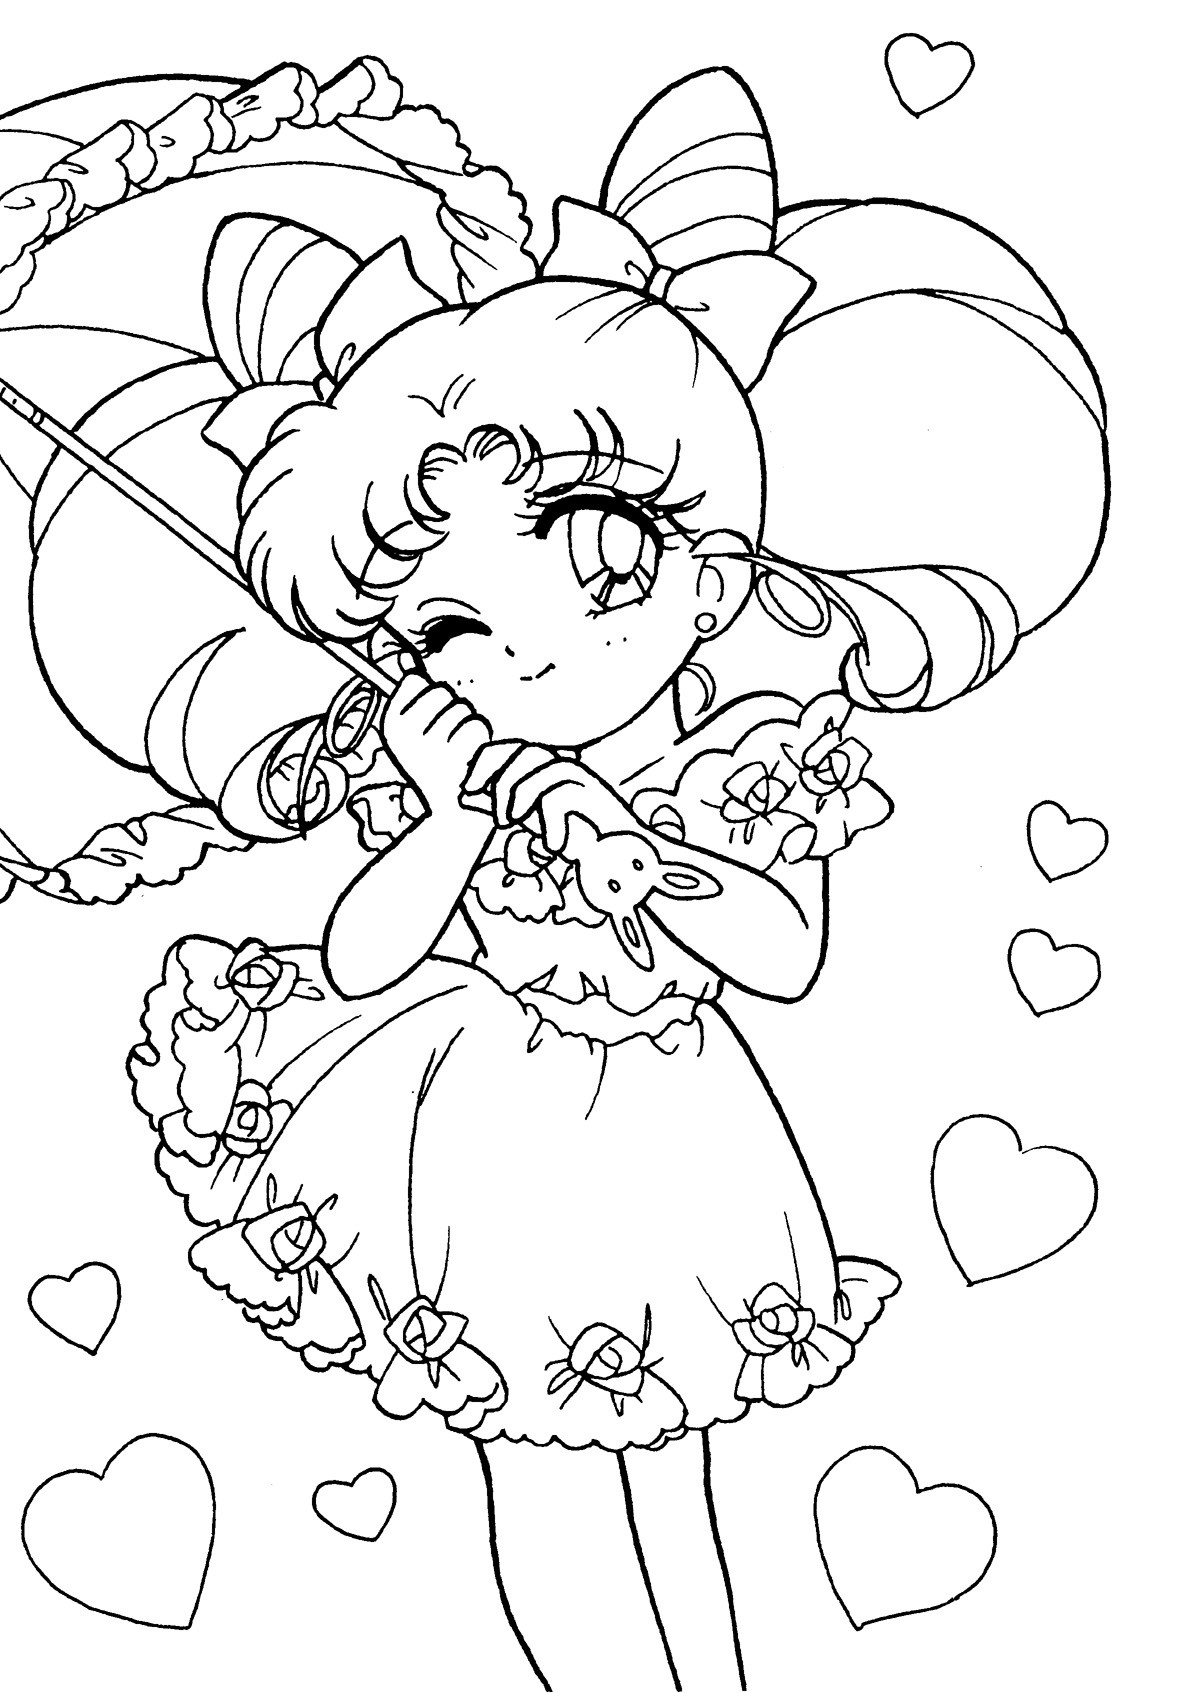 Coloring Pages Com  Sailor Moon Coloring Pages coloringsuite